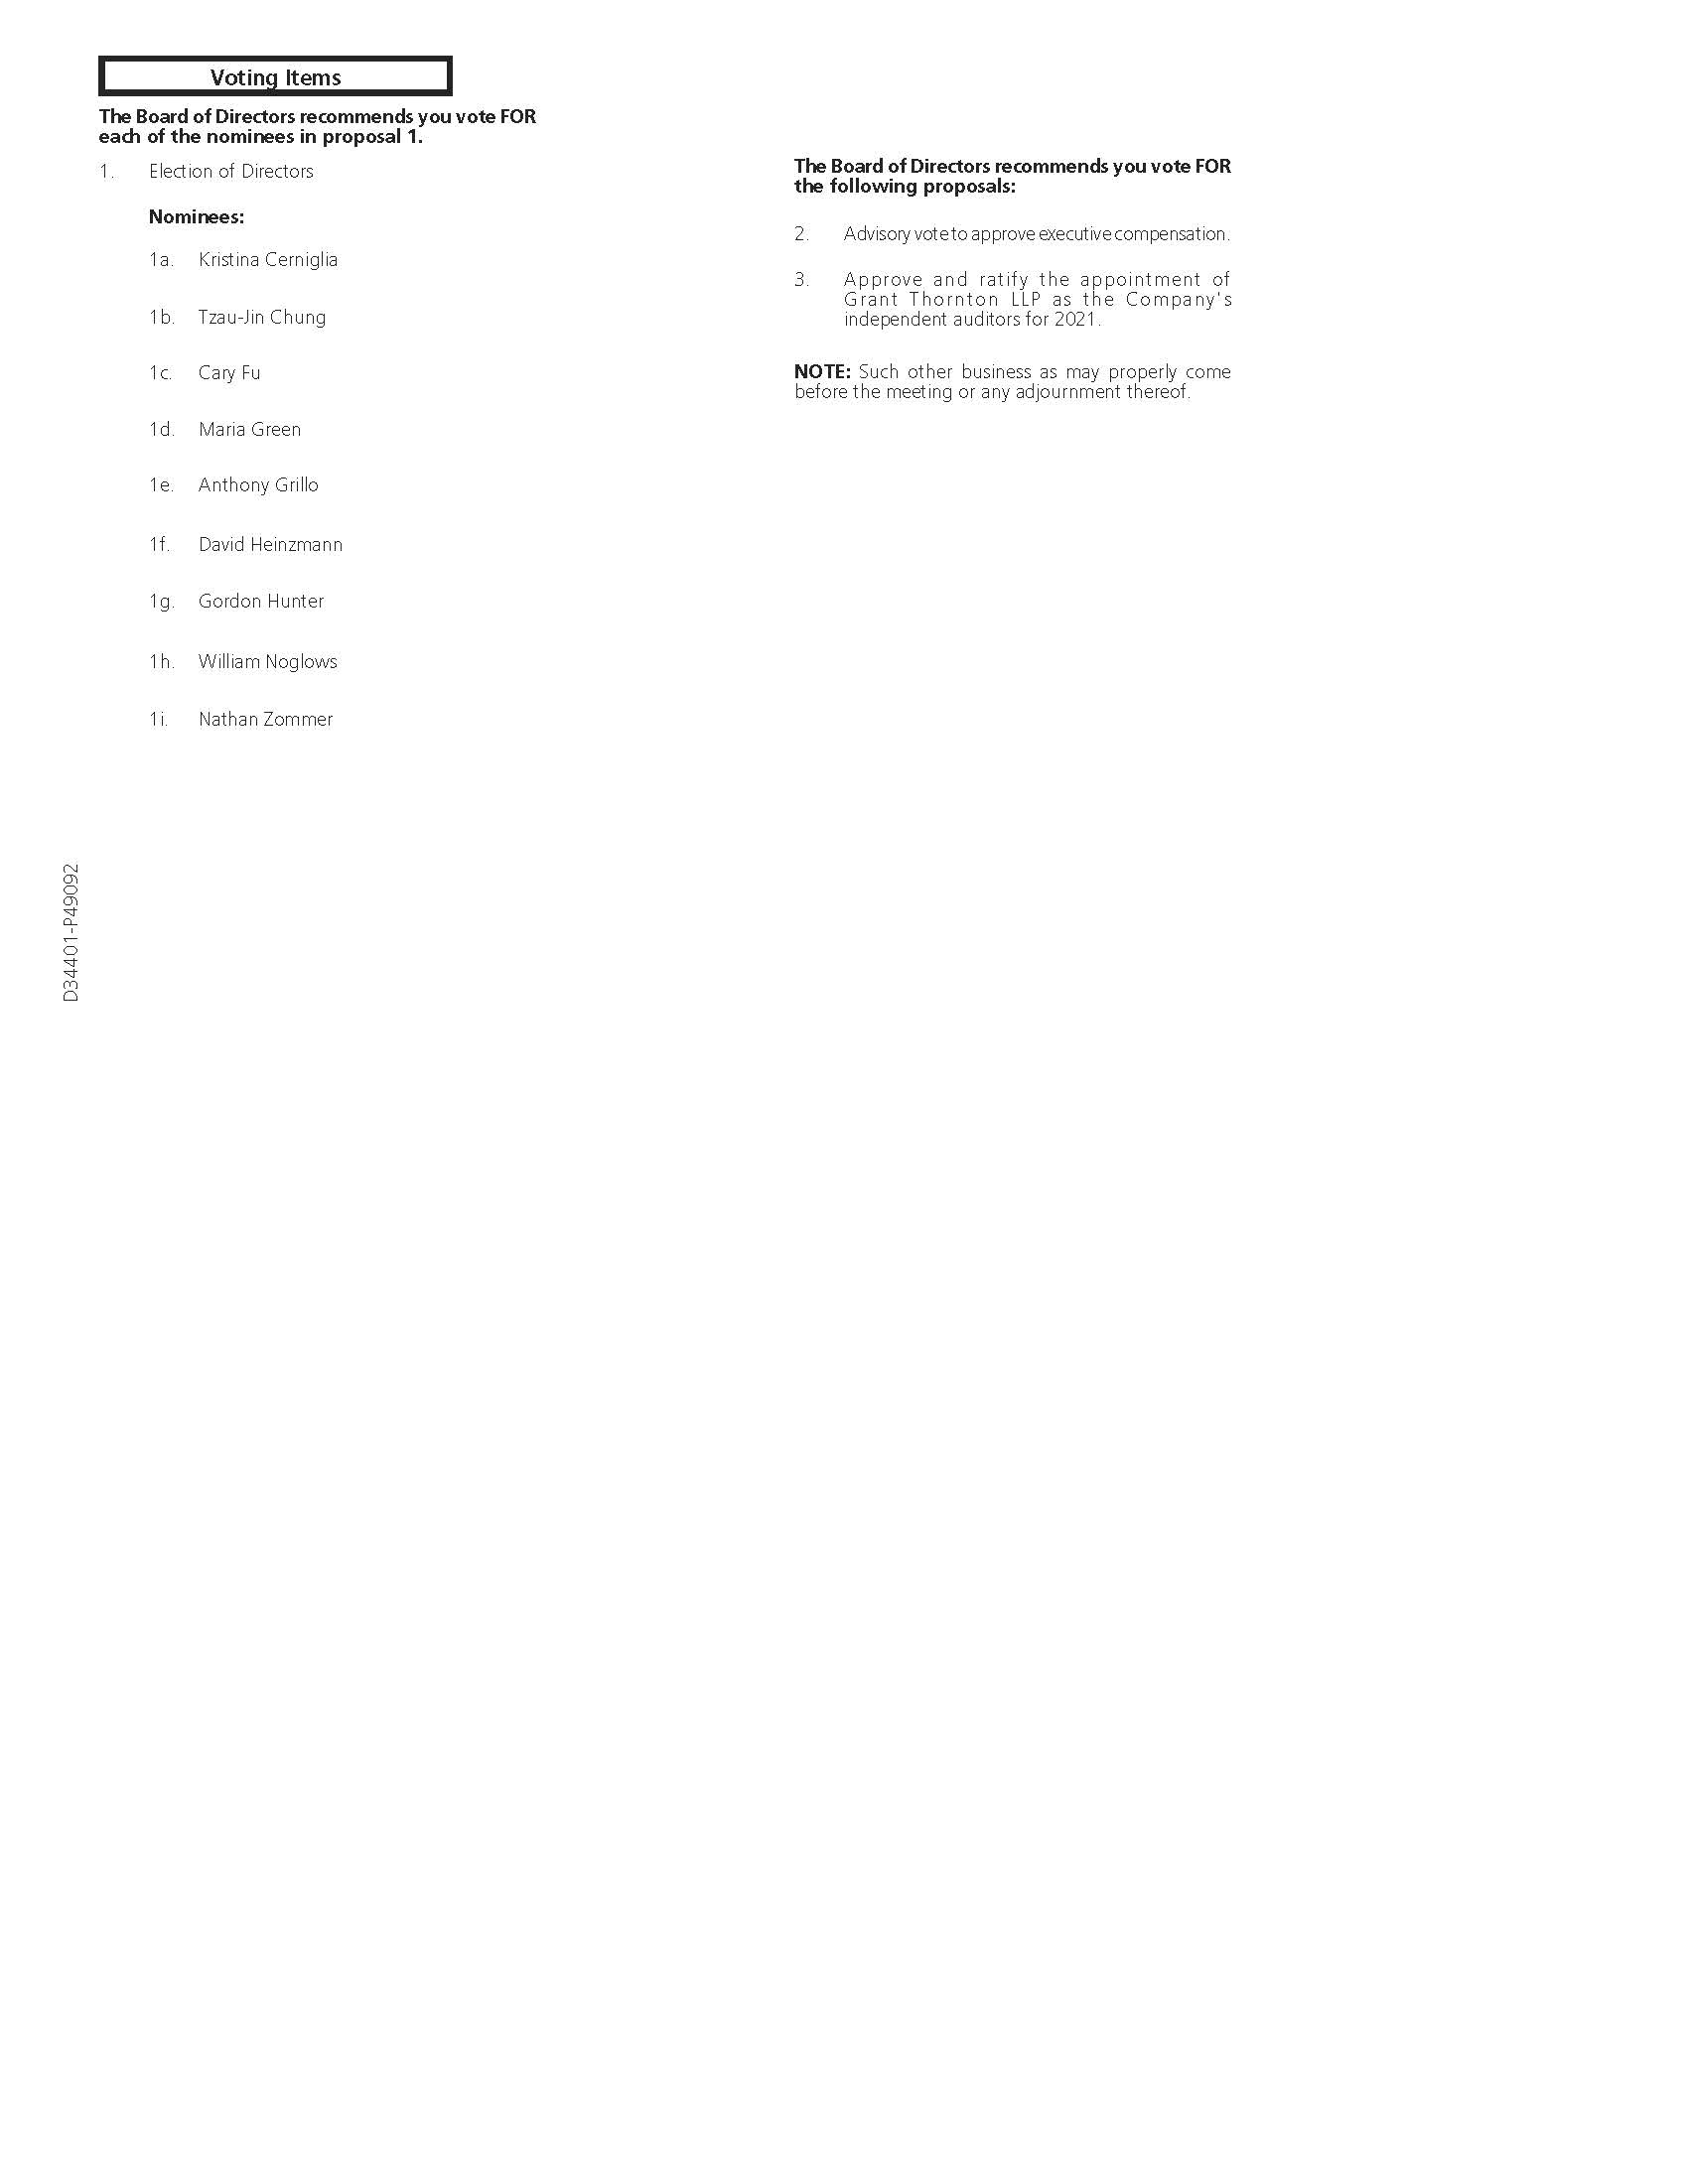 https://cdn.kscope.io/17b6a36d73fa2caeb0ddd1fbc7f757b1-proxynotice2021_pagex31.jpg